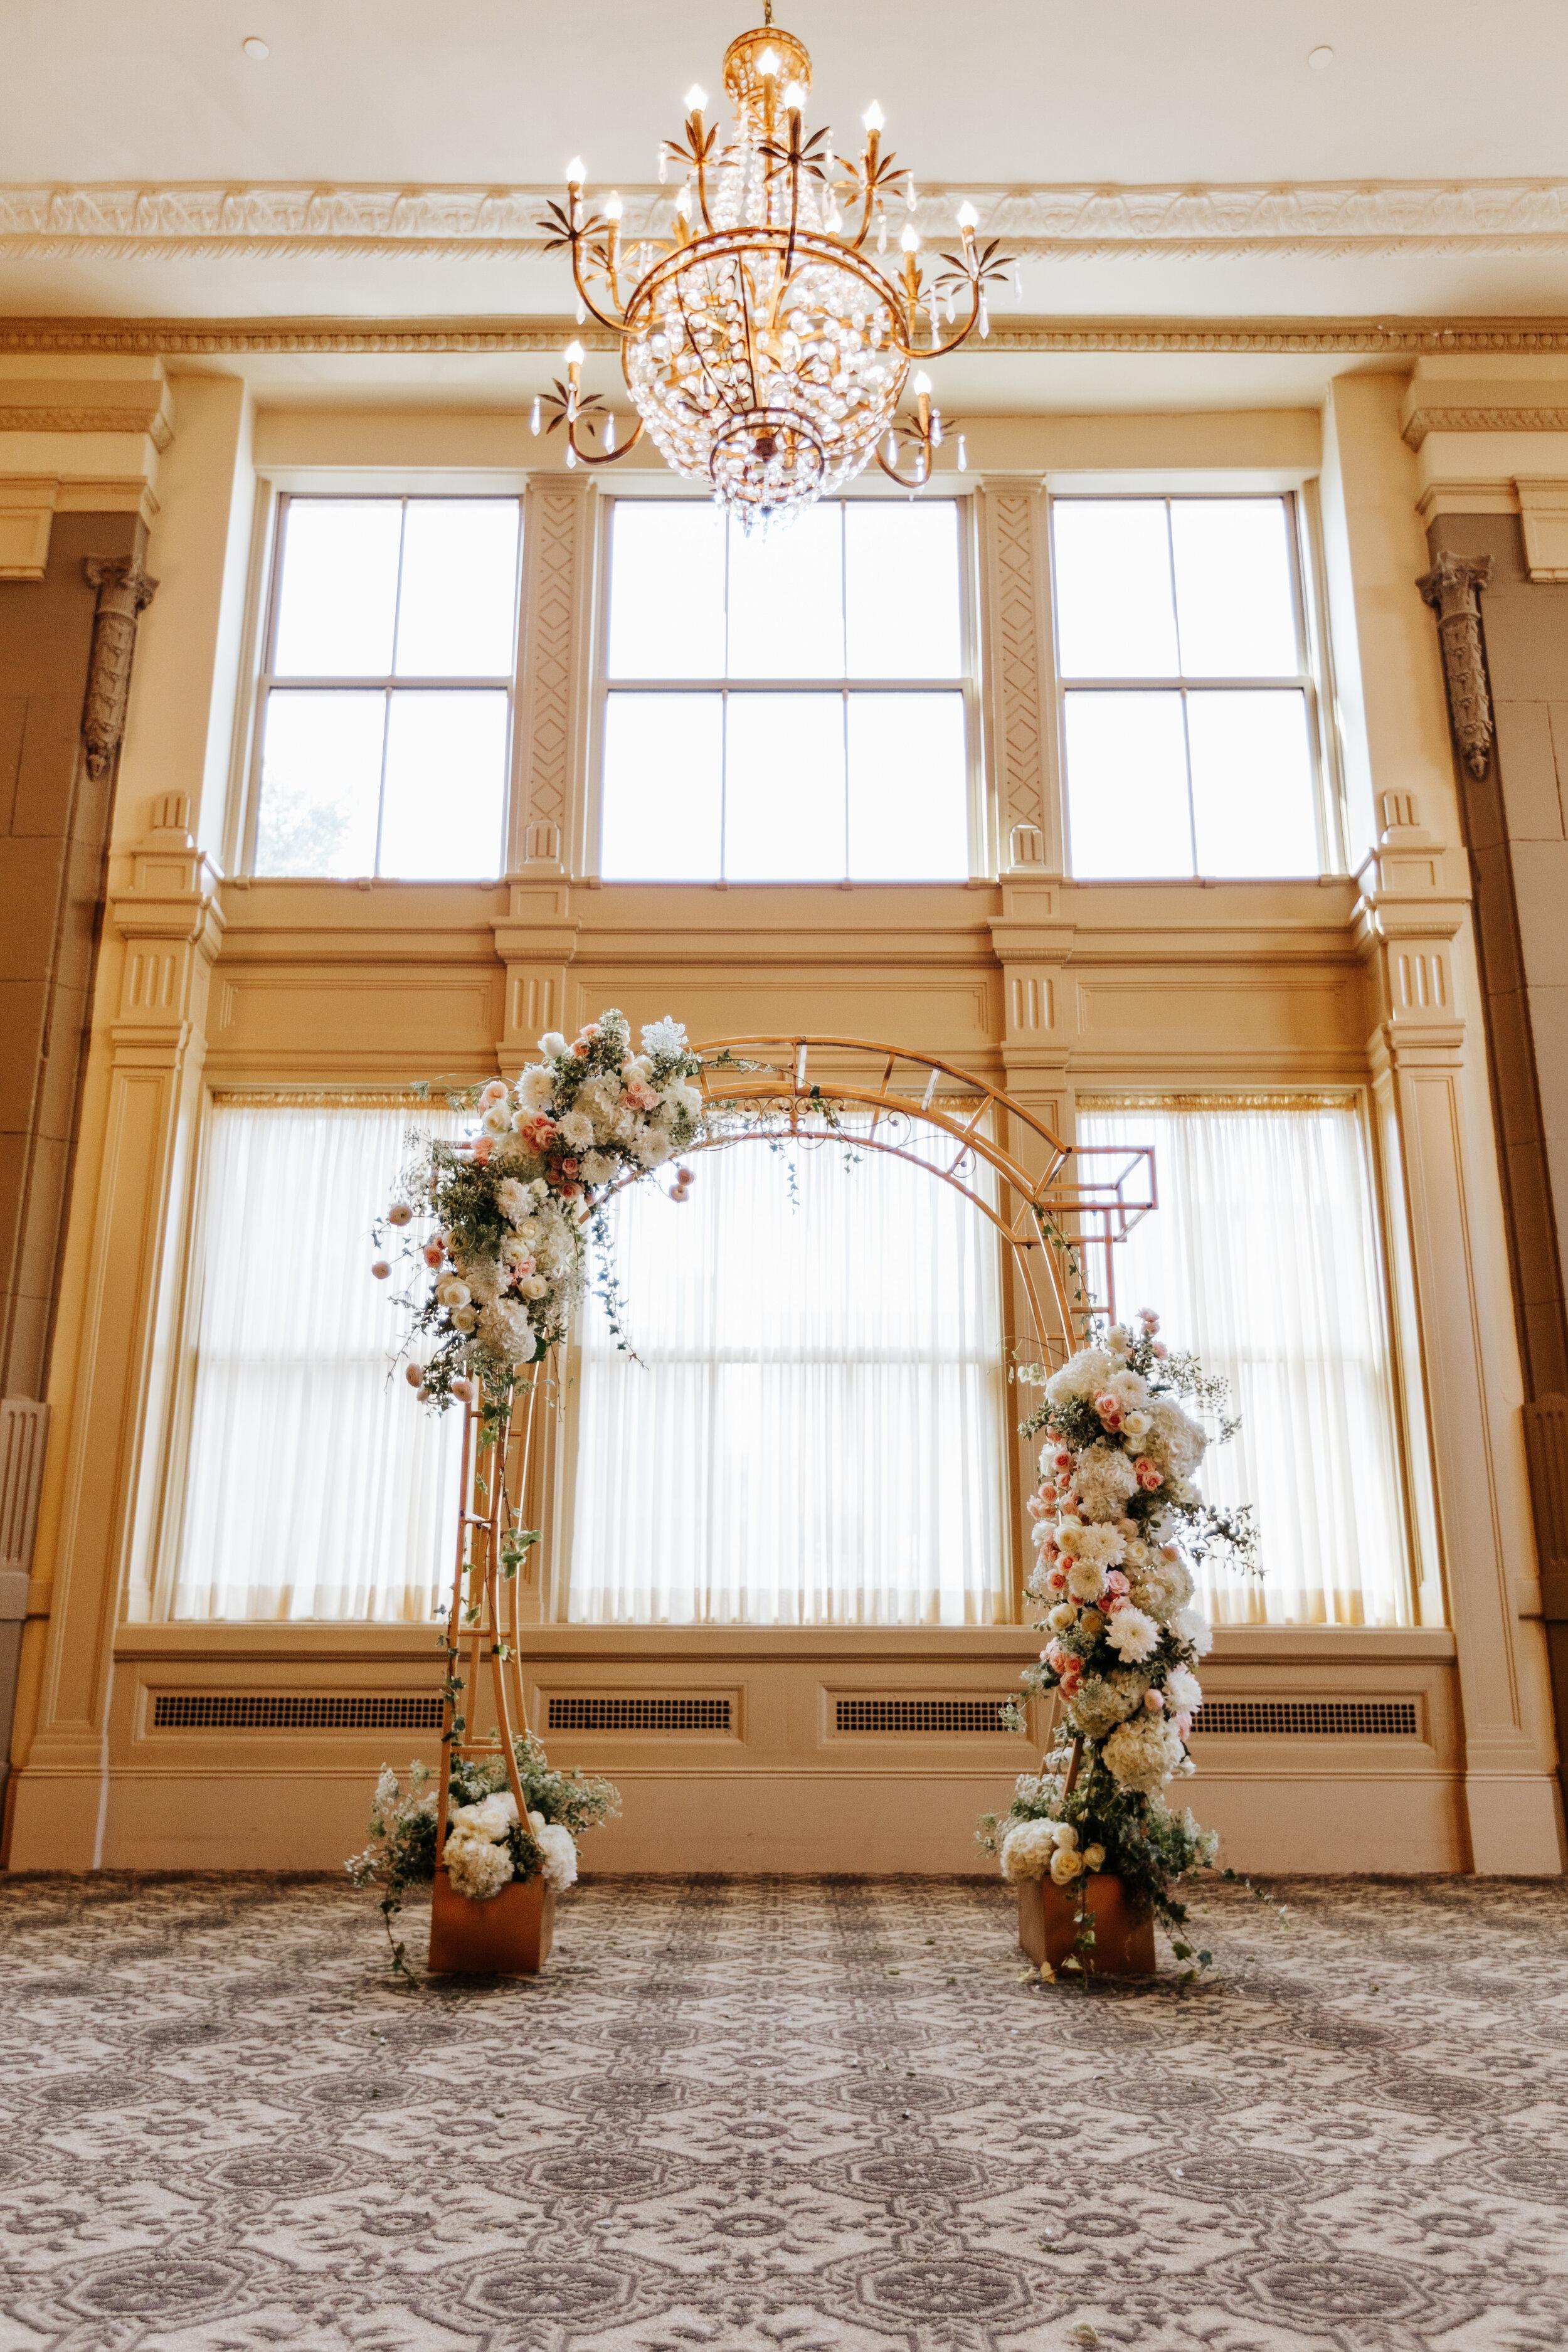 Cassie-Mrunal-Wedding-Quirk-Hotel-John-Marshall-Ballrooms-Richmond-Virginia-Photography-by-V-63.jpg